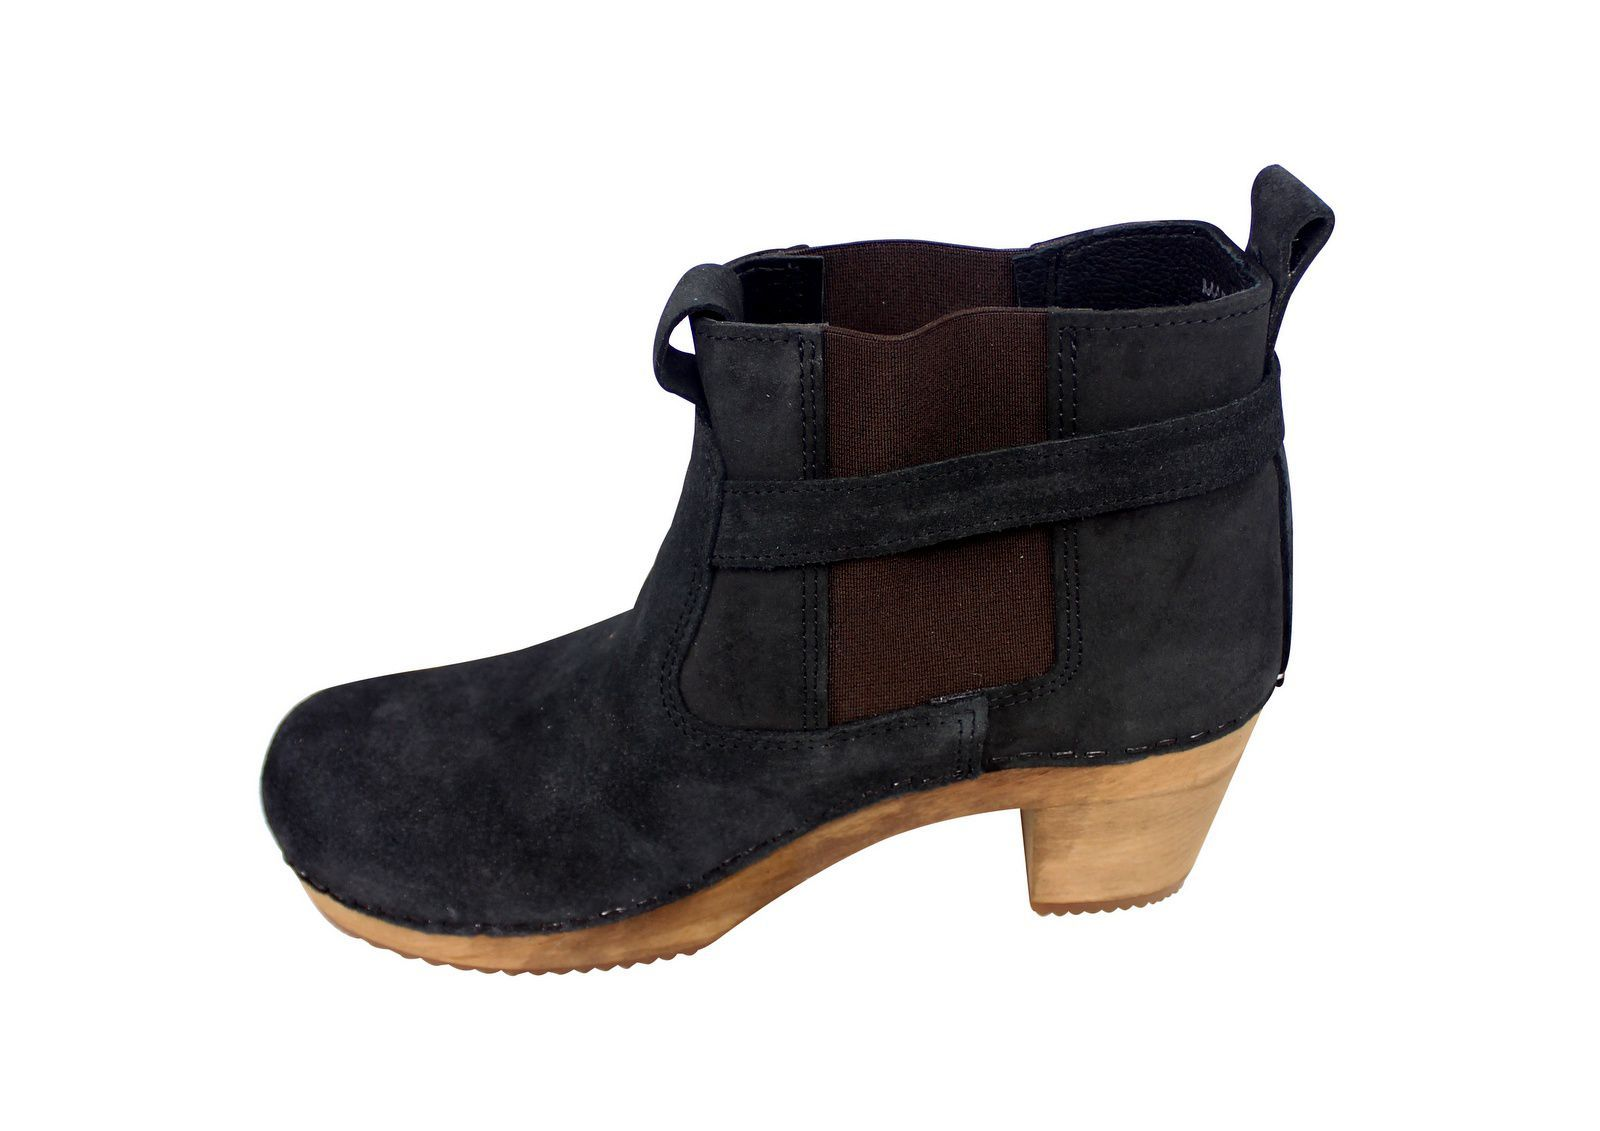 Sanita Peggy Sue Jodphur style ankle boots Black Rev Side 2